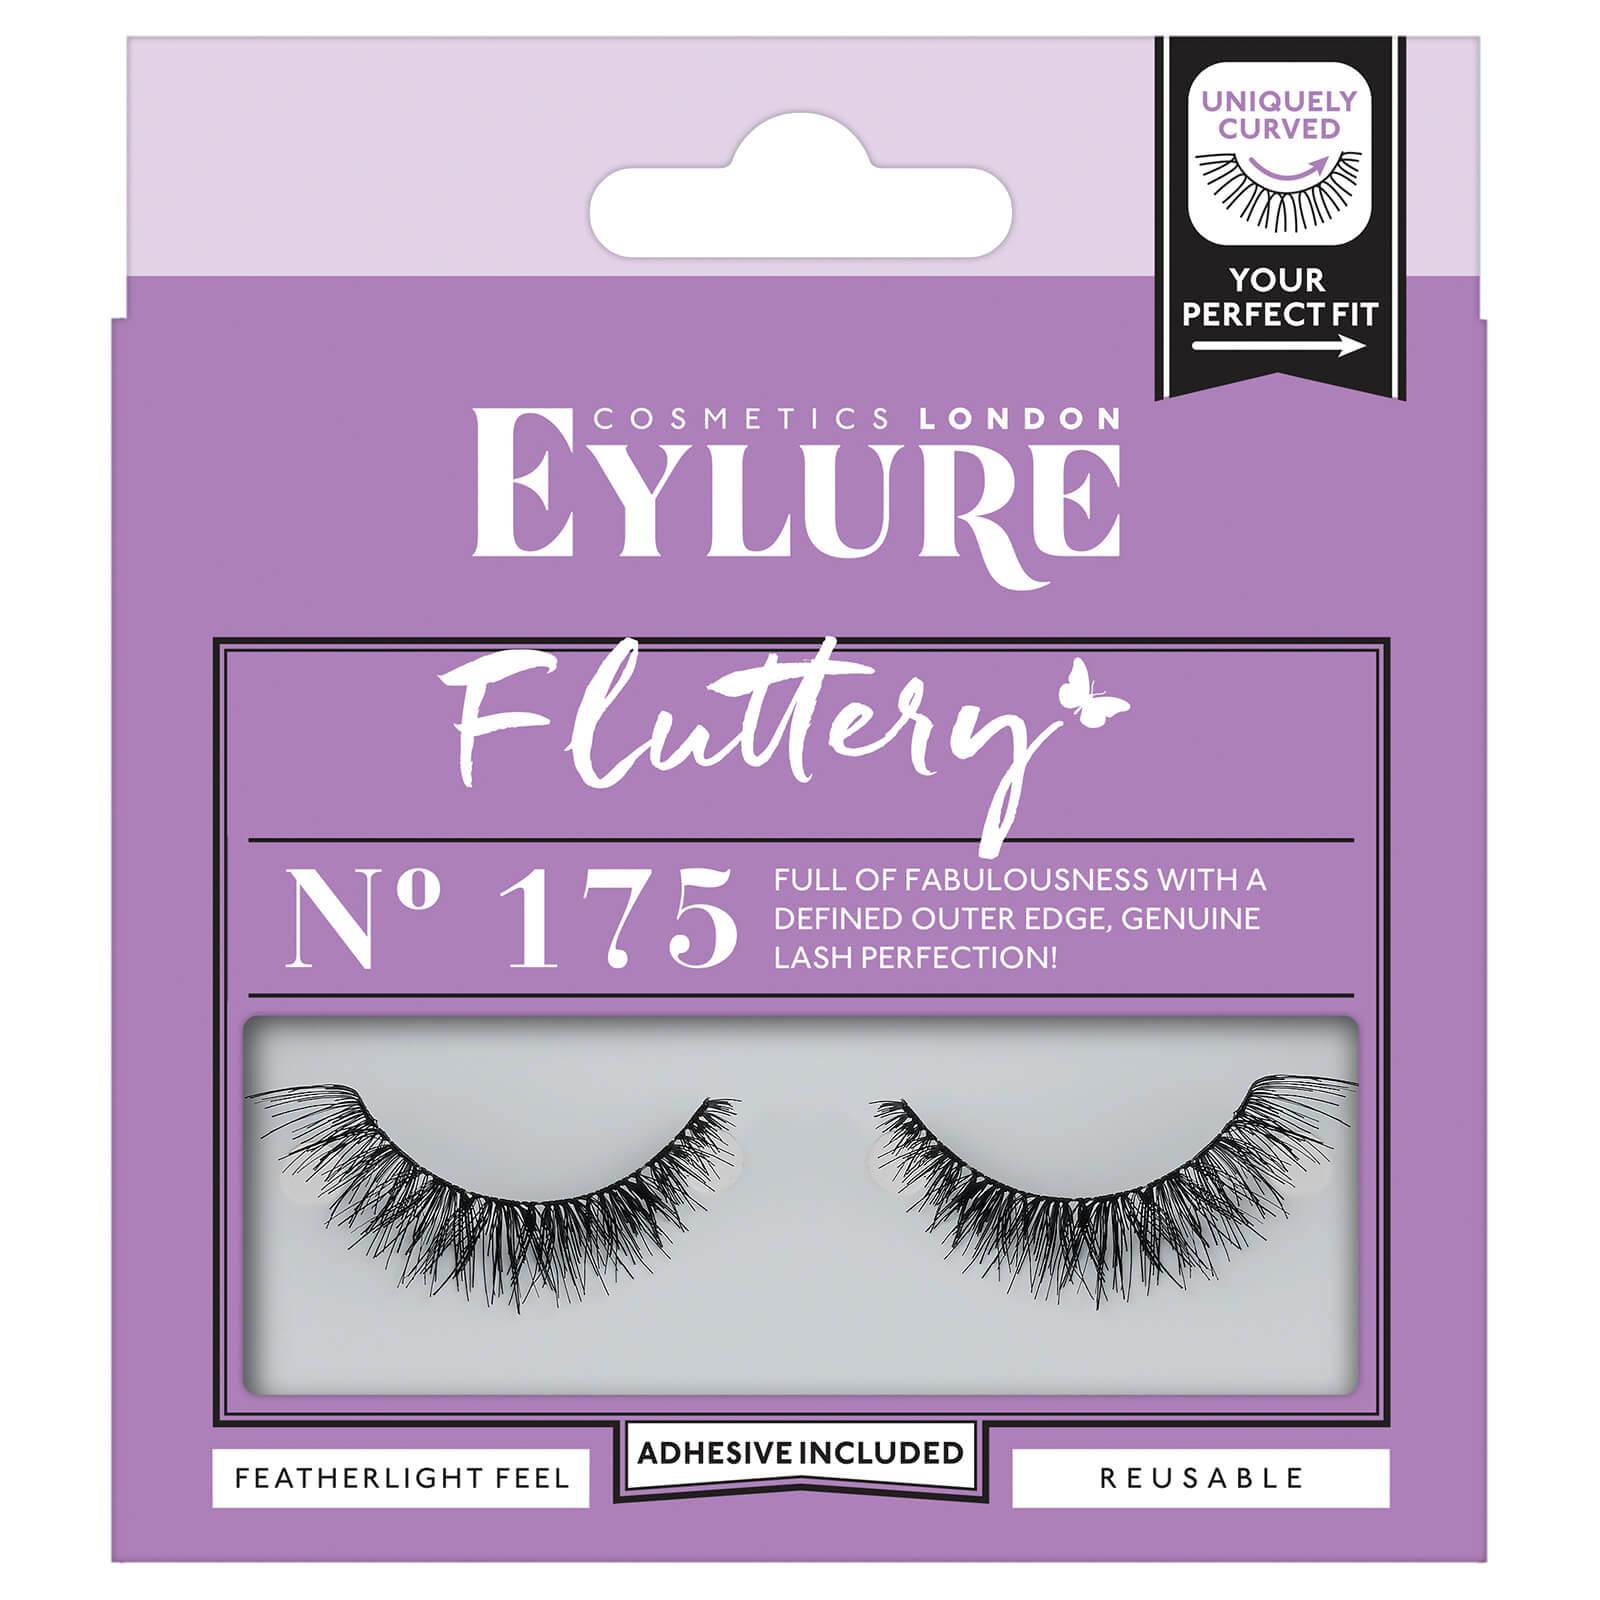 0782454bafb Eylure Fluttery 175 Lashes | Free Shipping | Lookfantastic